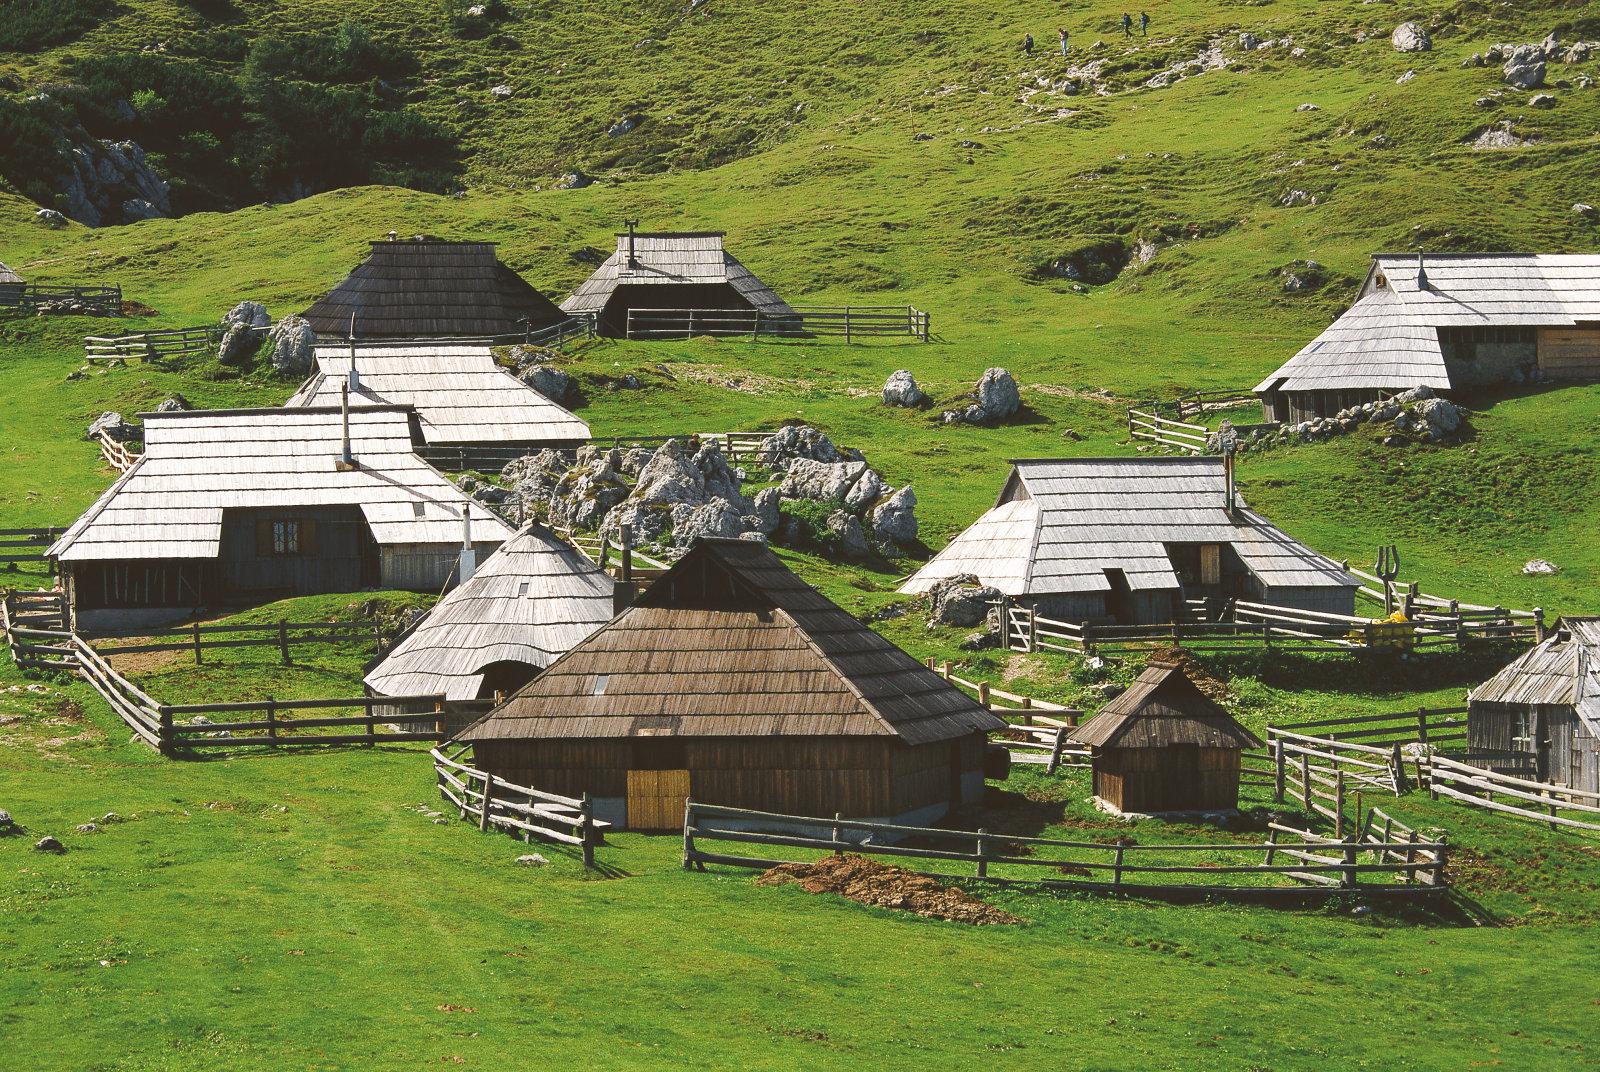 velika-planina-settlement